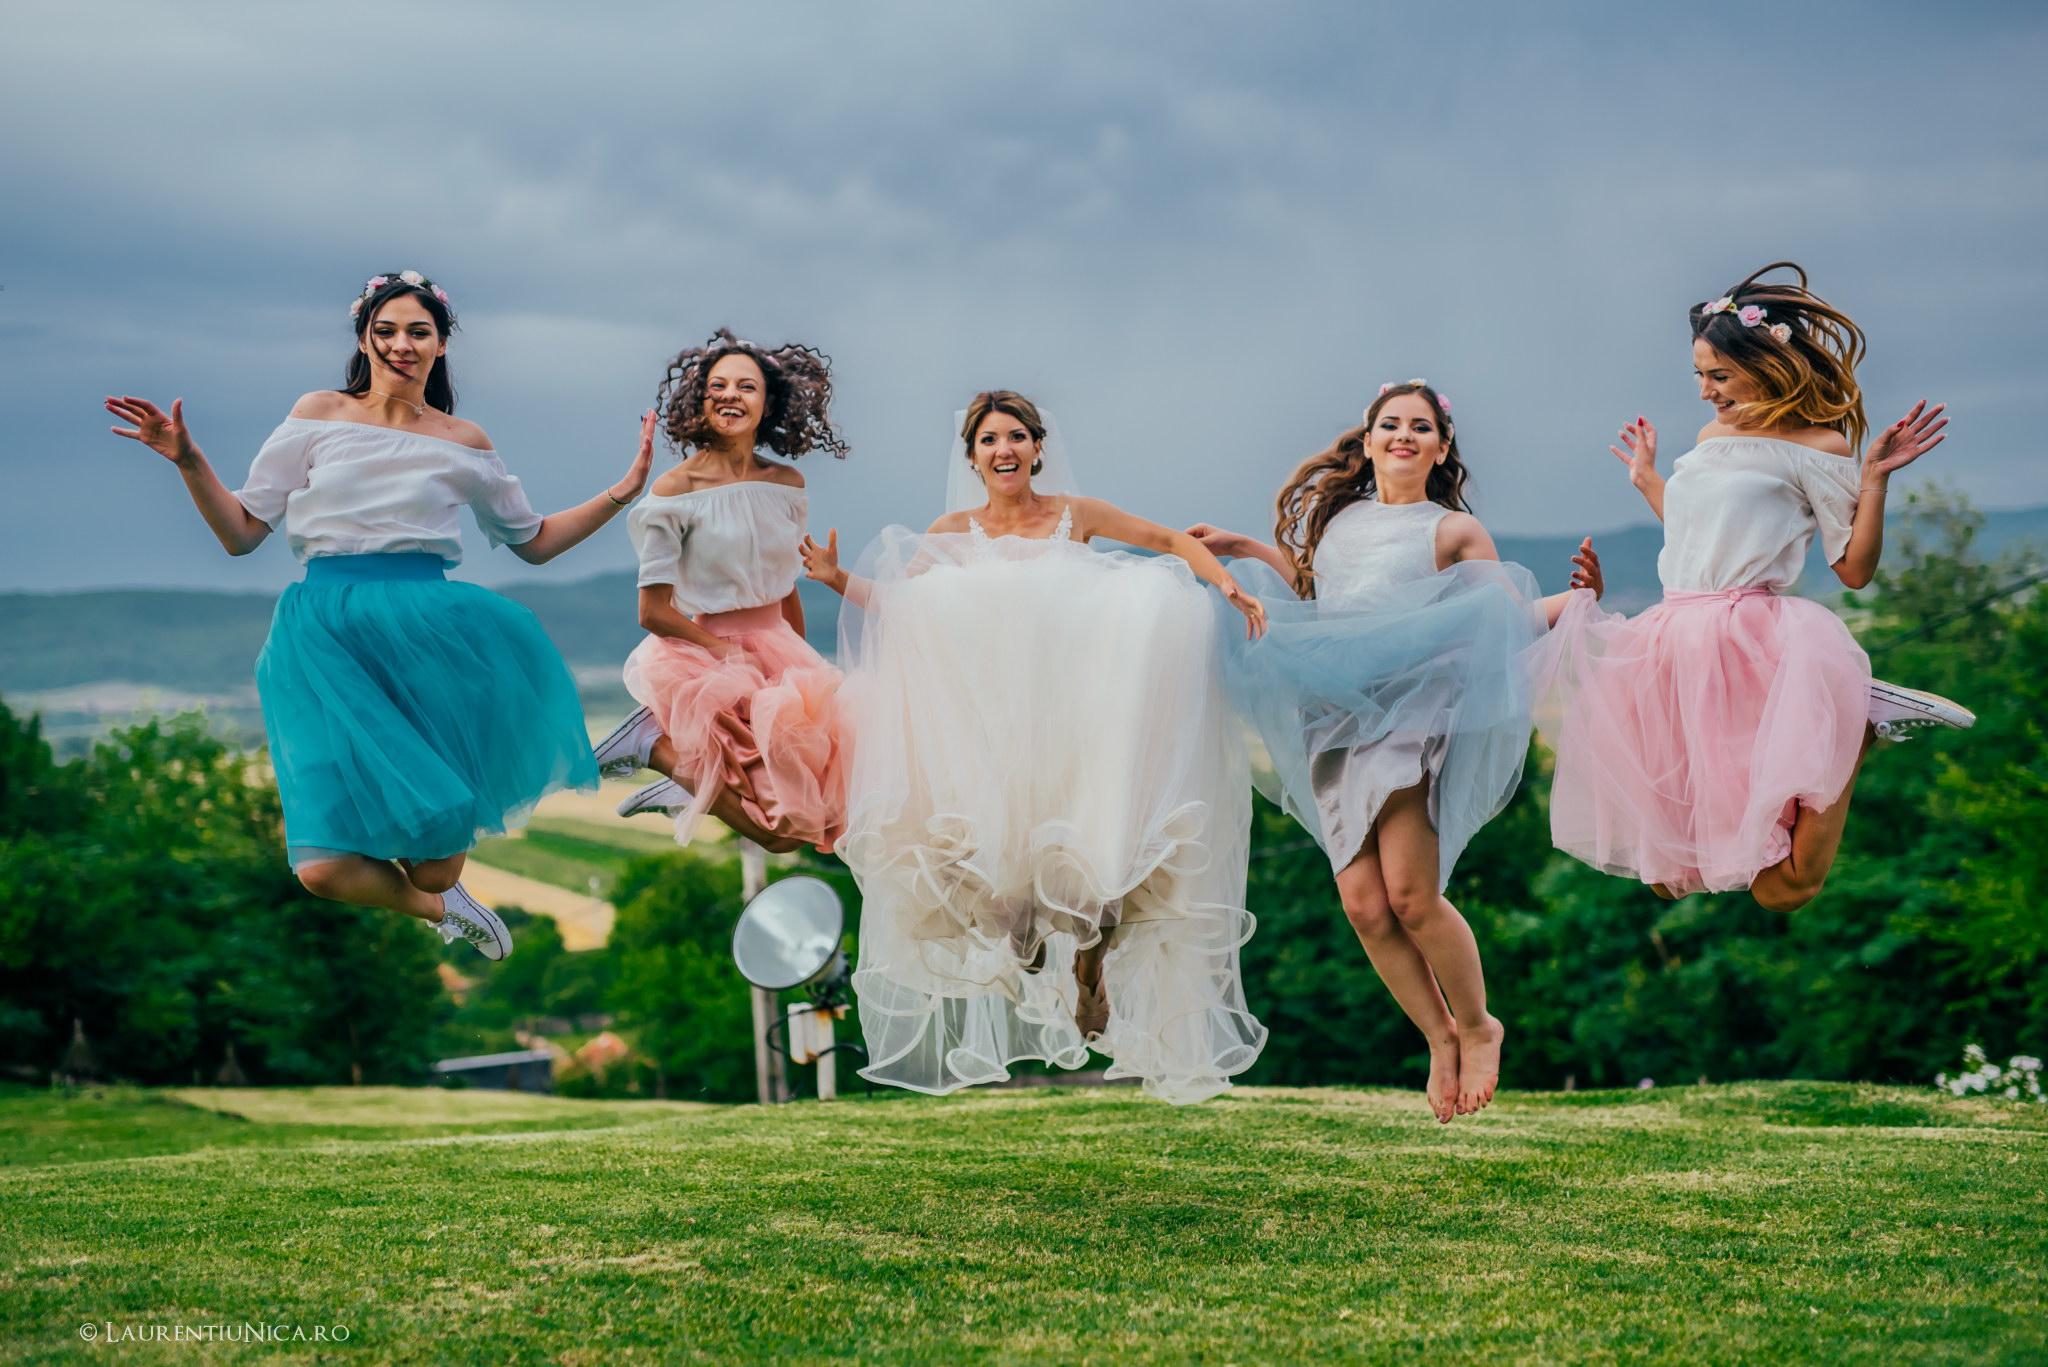 madalina madalin fotograf nunta laurentiu nica turceni gorj 24 - Madalina & Madalin | Fotografii nunta | Judetul Gorj